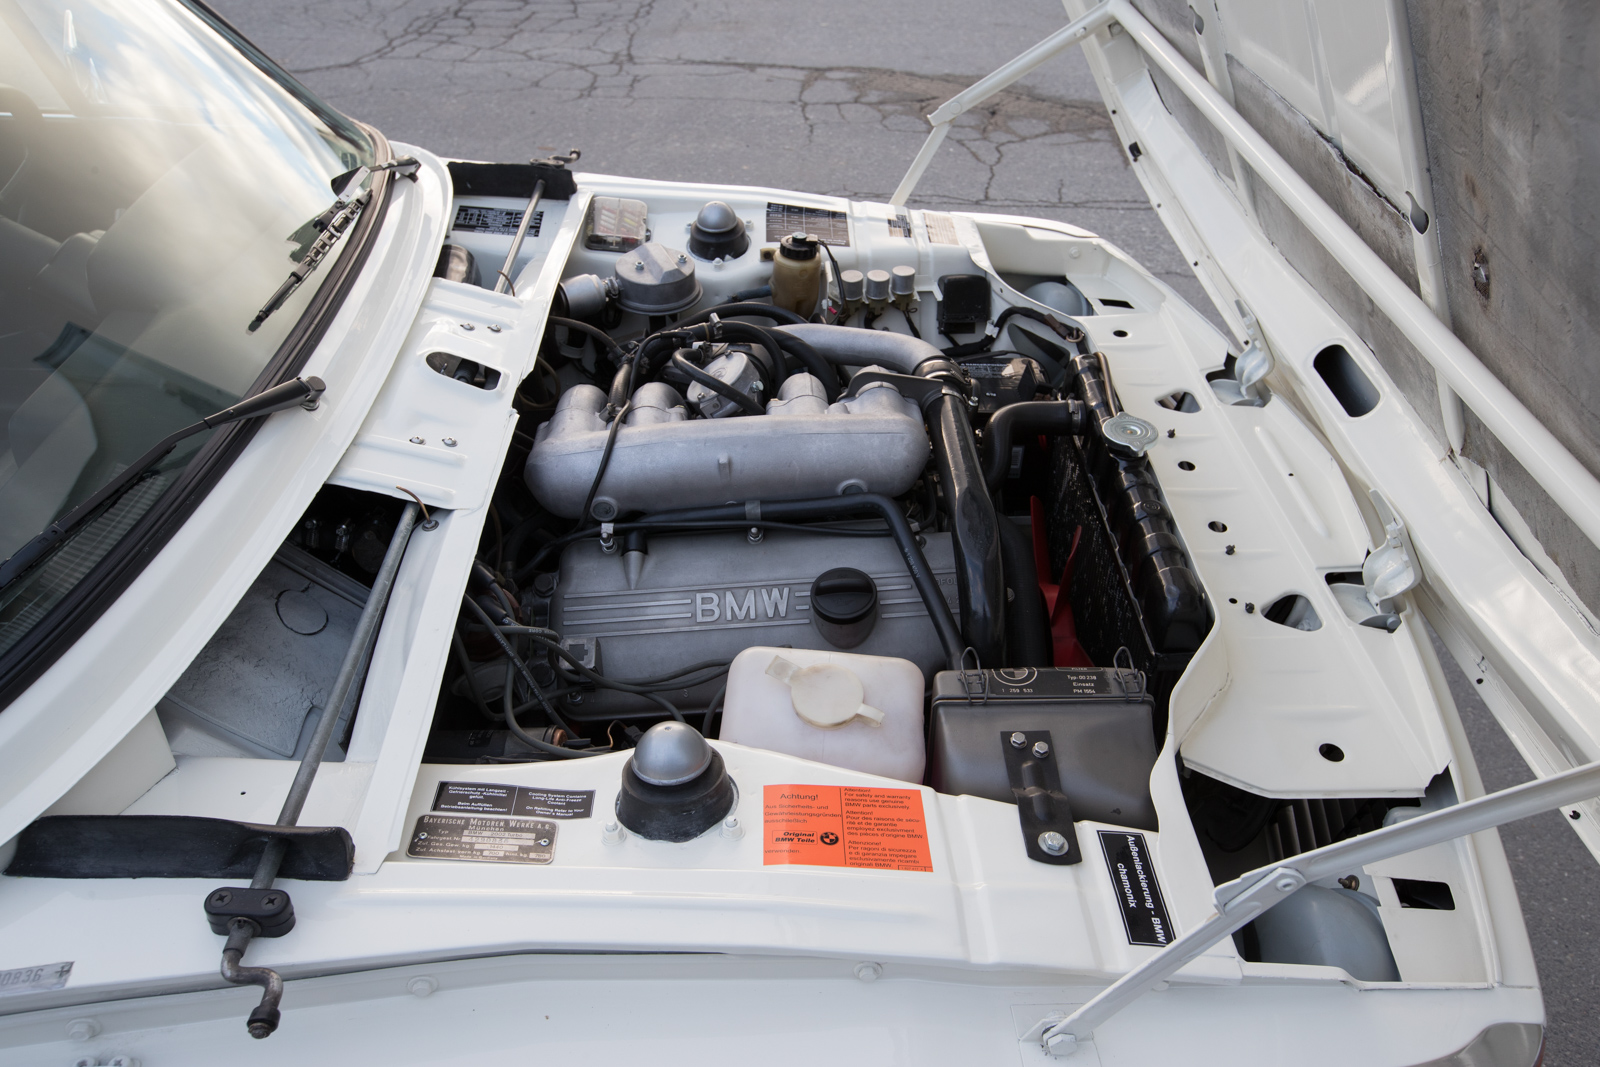 1974 BMW 2002 Turbo engine compartment